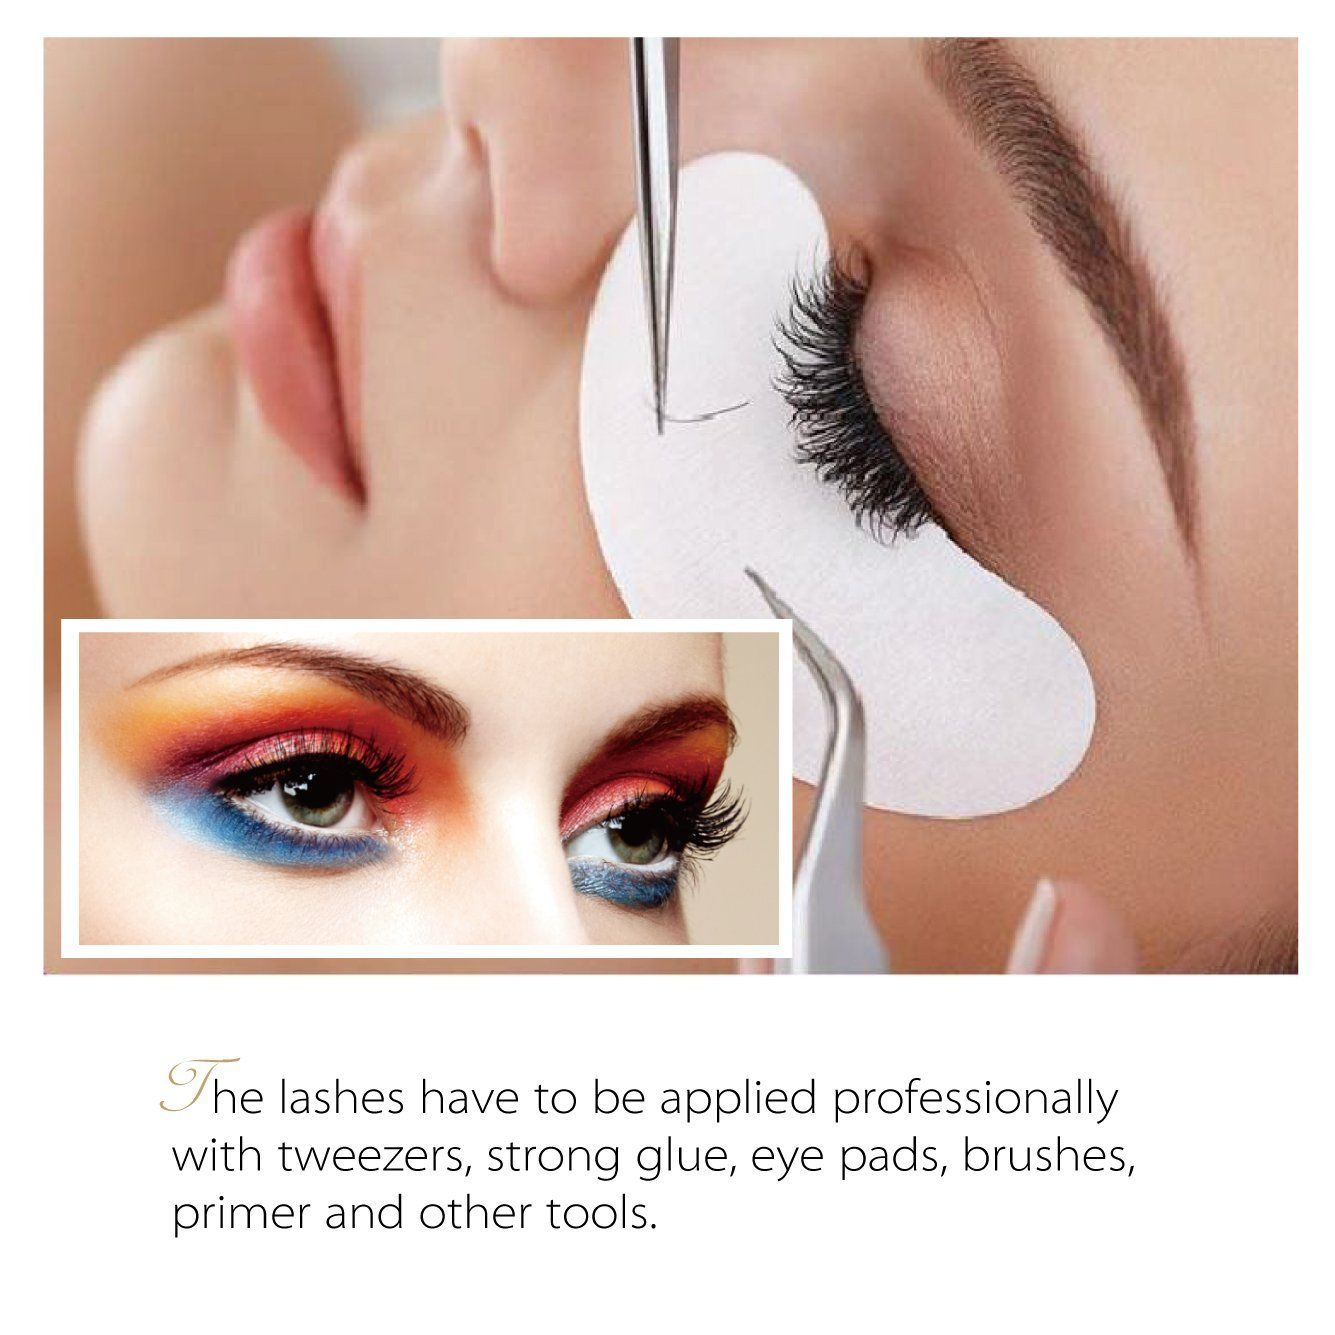 7fe20abb93a Amazon.com: Beyelian Beauty Mink Eyelash Extensions Charming D Curl 0.20mm  Mixed Tray (7-15mm Assorted) Individual Semi Permanent Professional Use  False ...